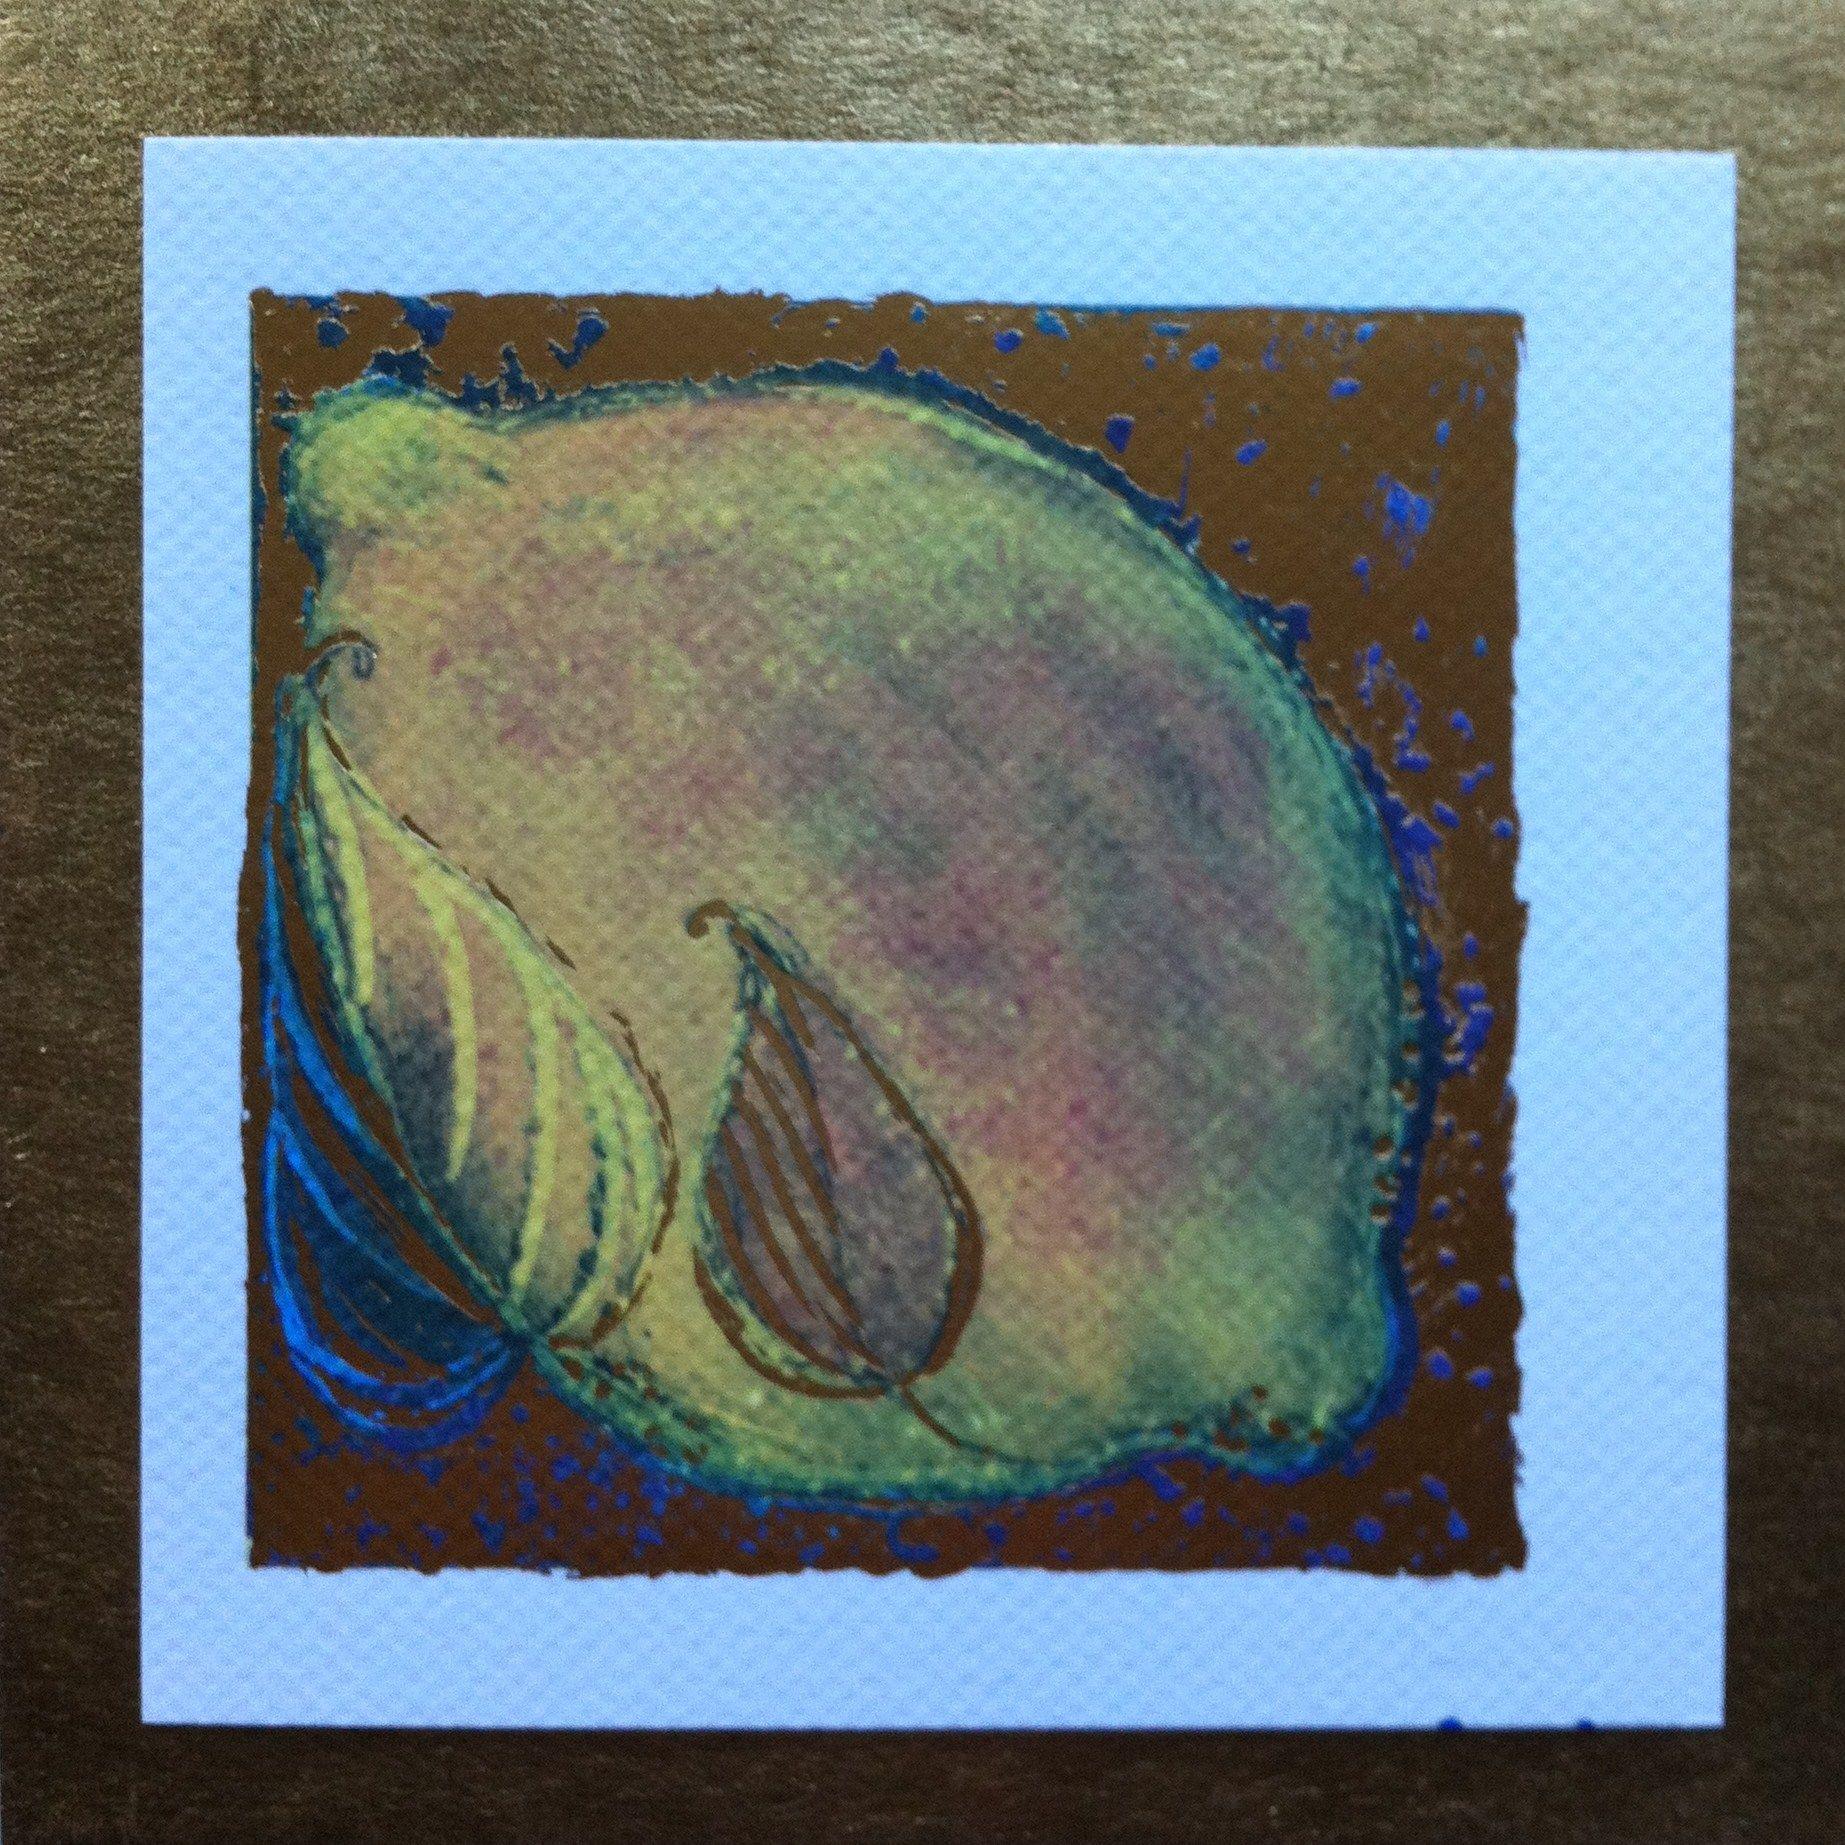 Lemon Limited edition print gilded,12cm x12cm byCassandra Wainhouse